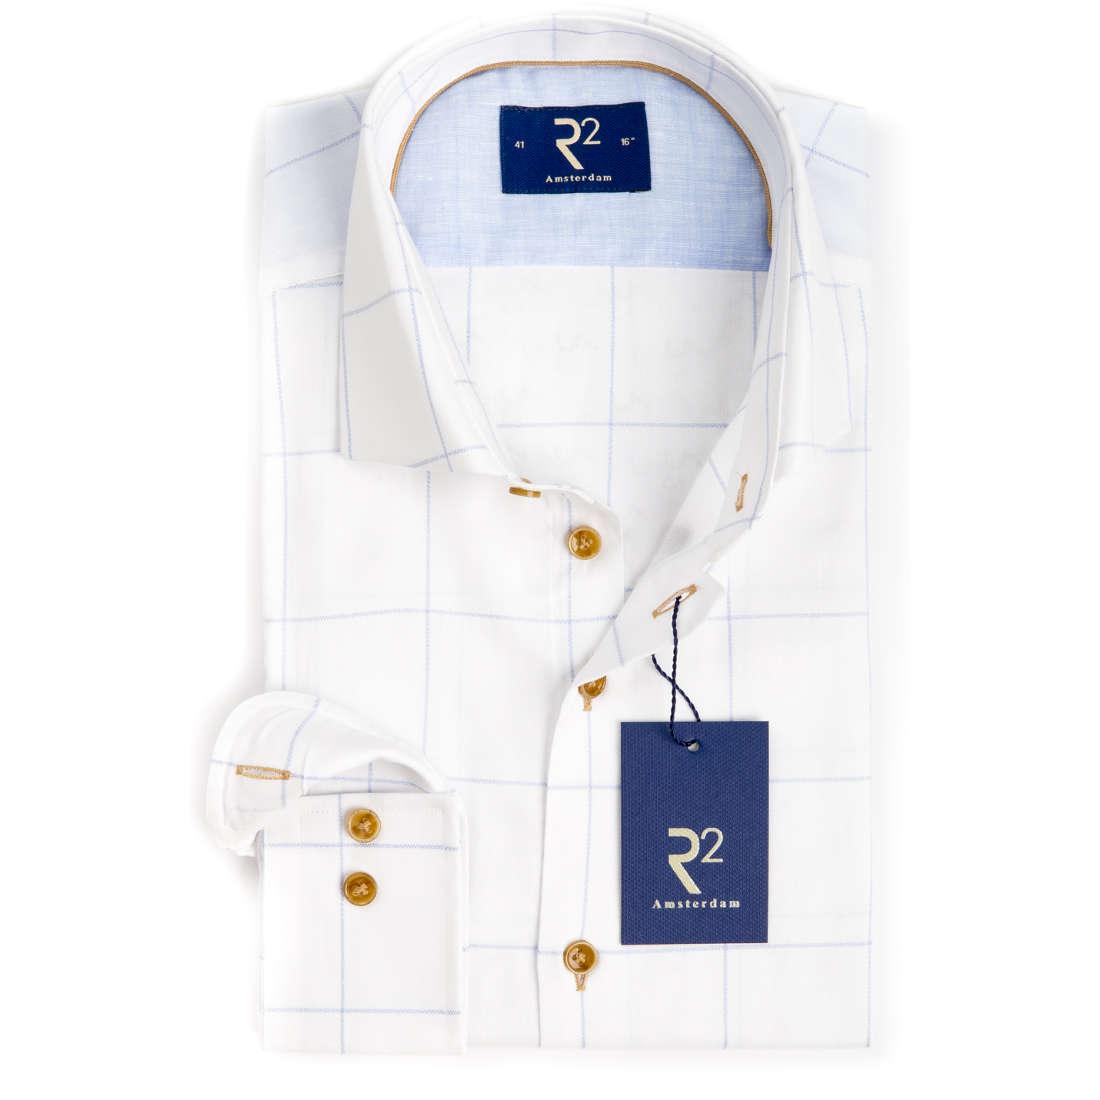 R2 overhemd Modern Fit 104wsp091/018 in het Wit/Blauw